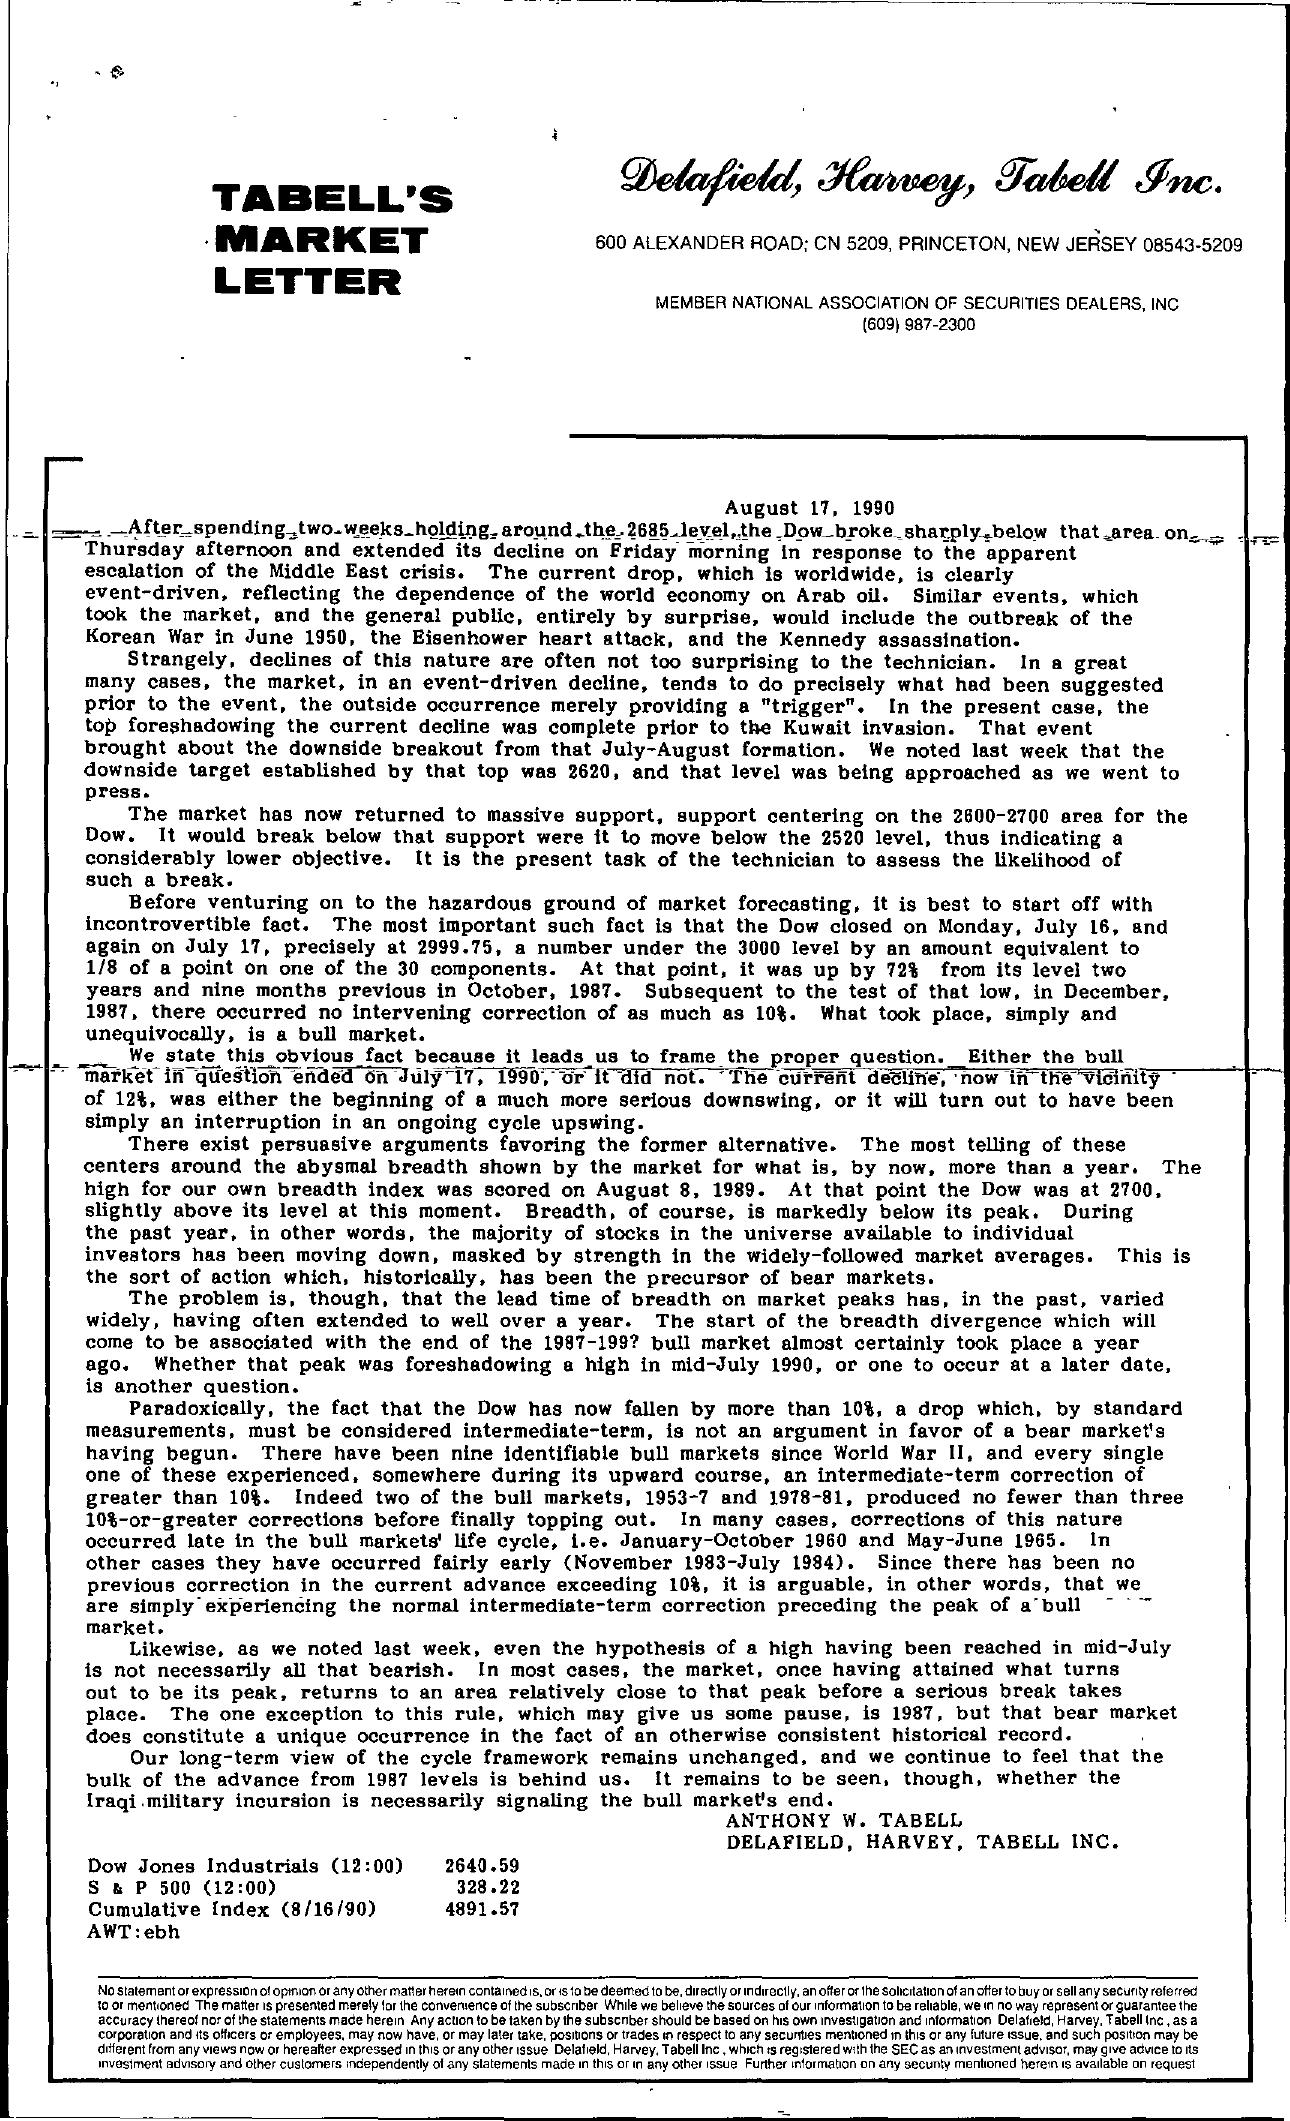 Tabell's Market Letter - August 17, 1990